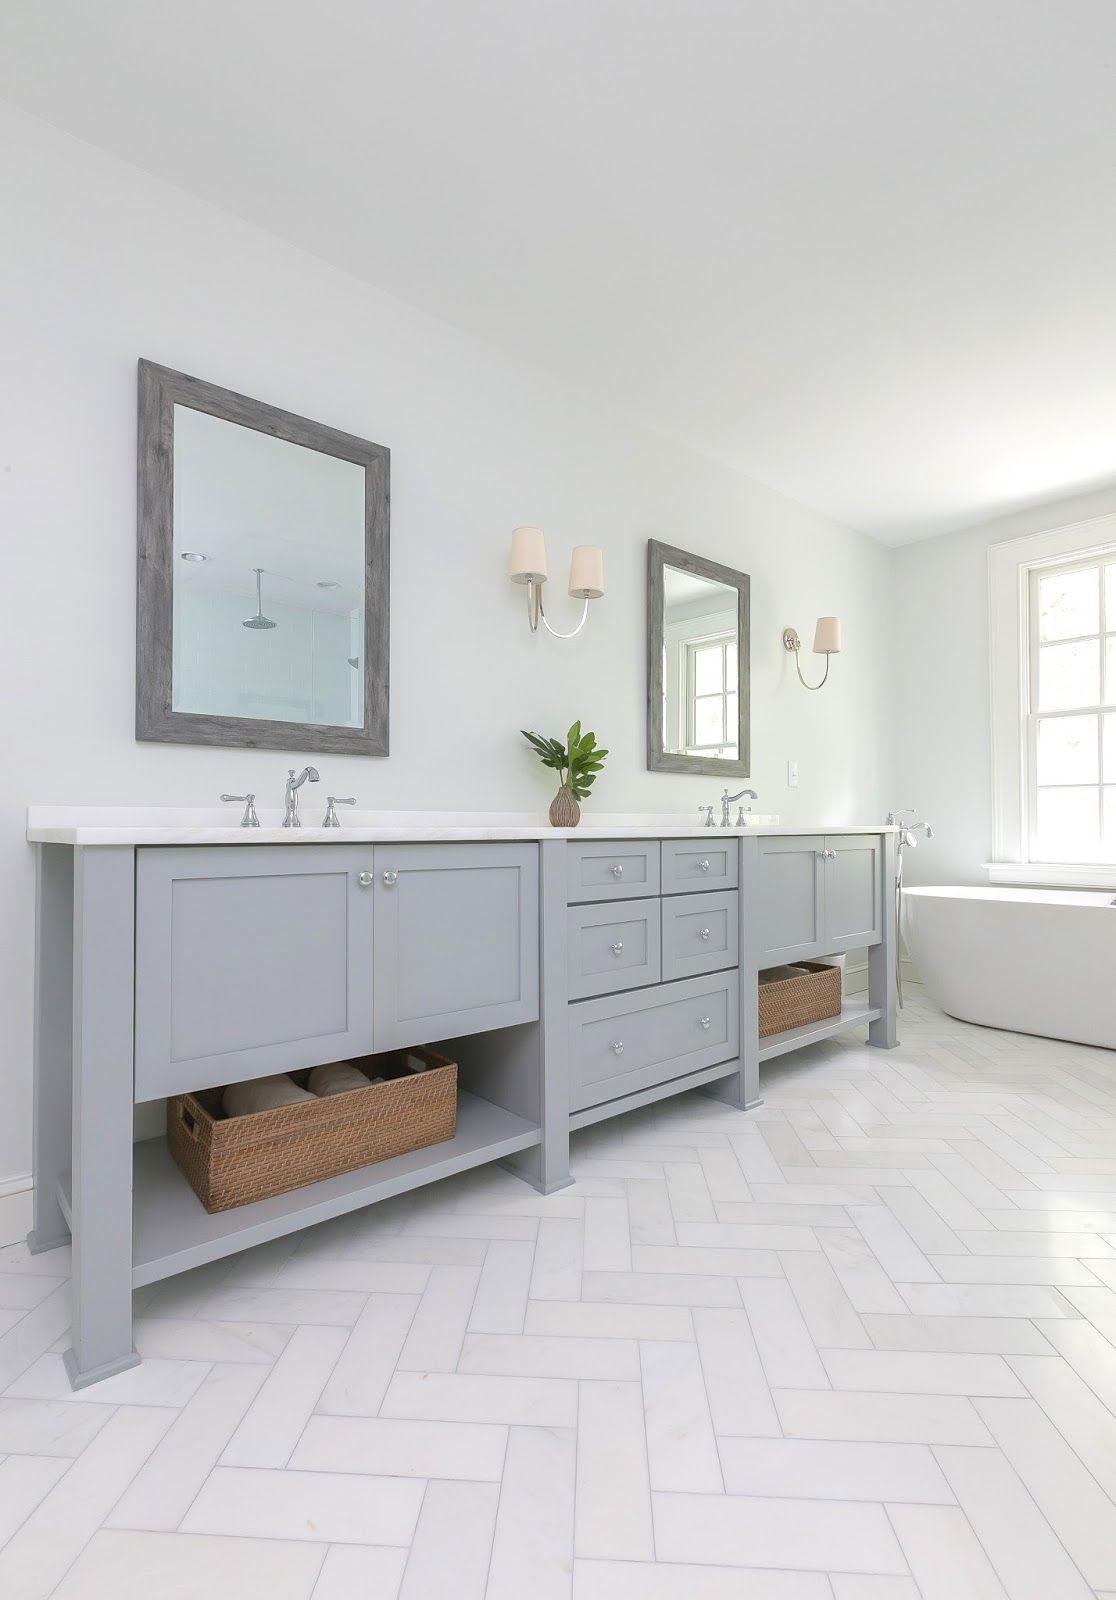 Gilded Mint Herringbone Marble Floor Master Bathroom Renovation Small Bathroom Floor Cabinet